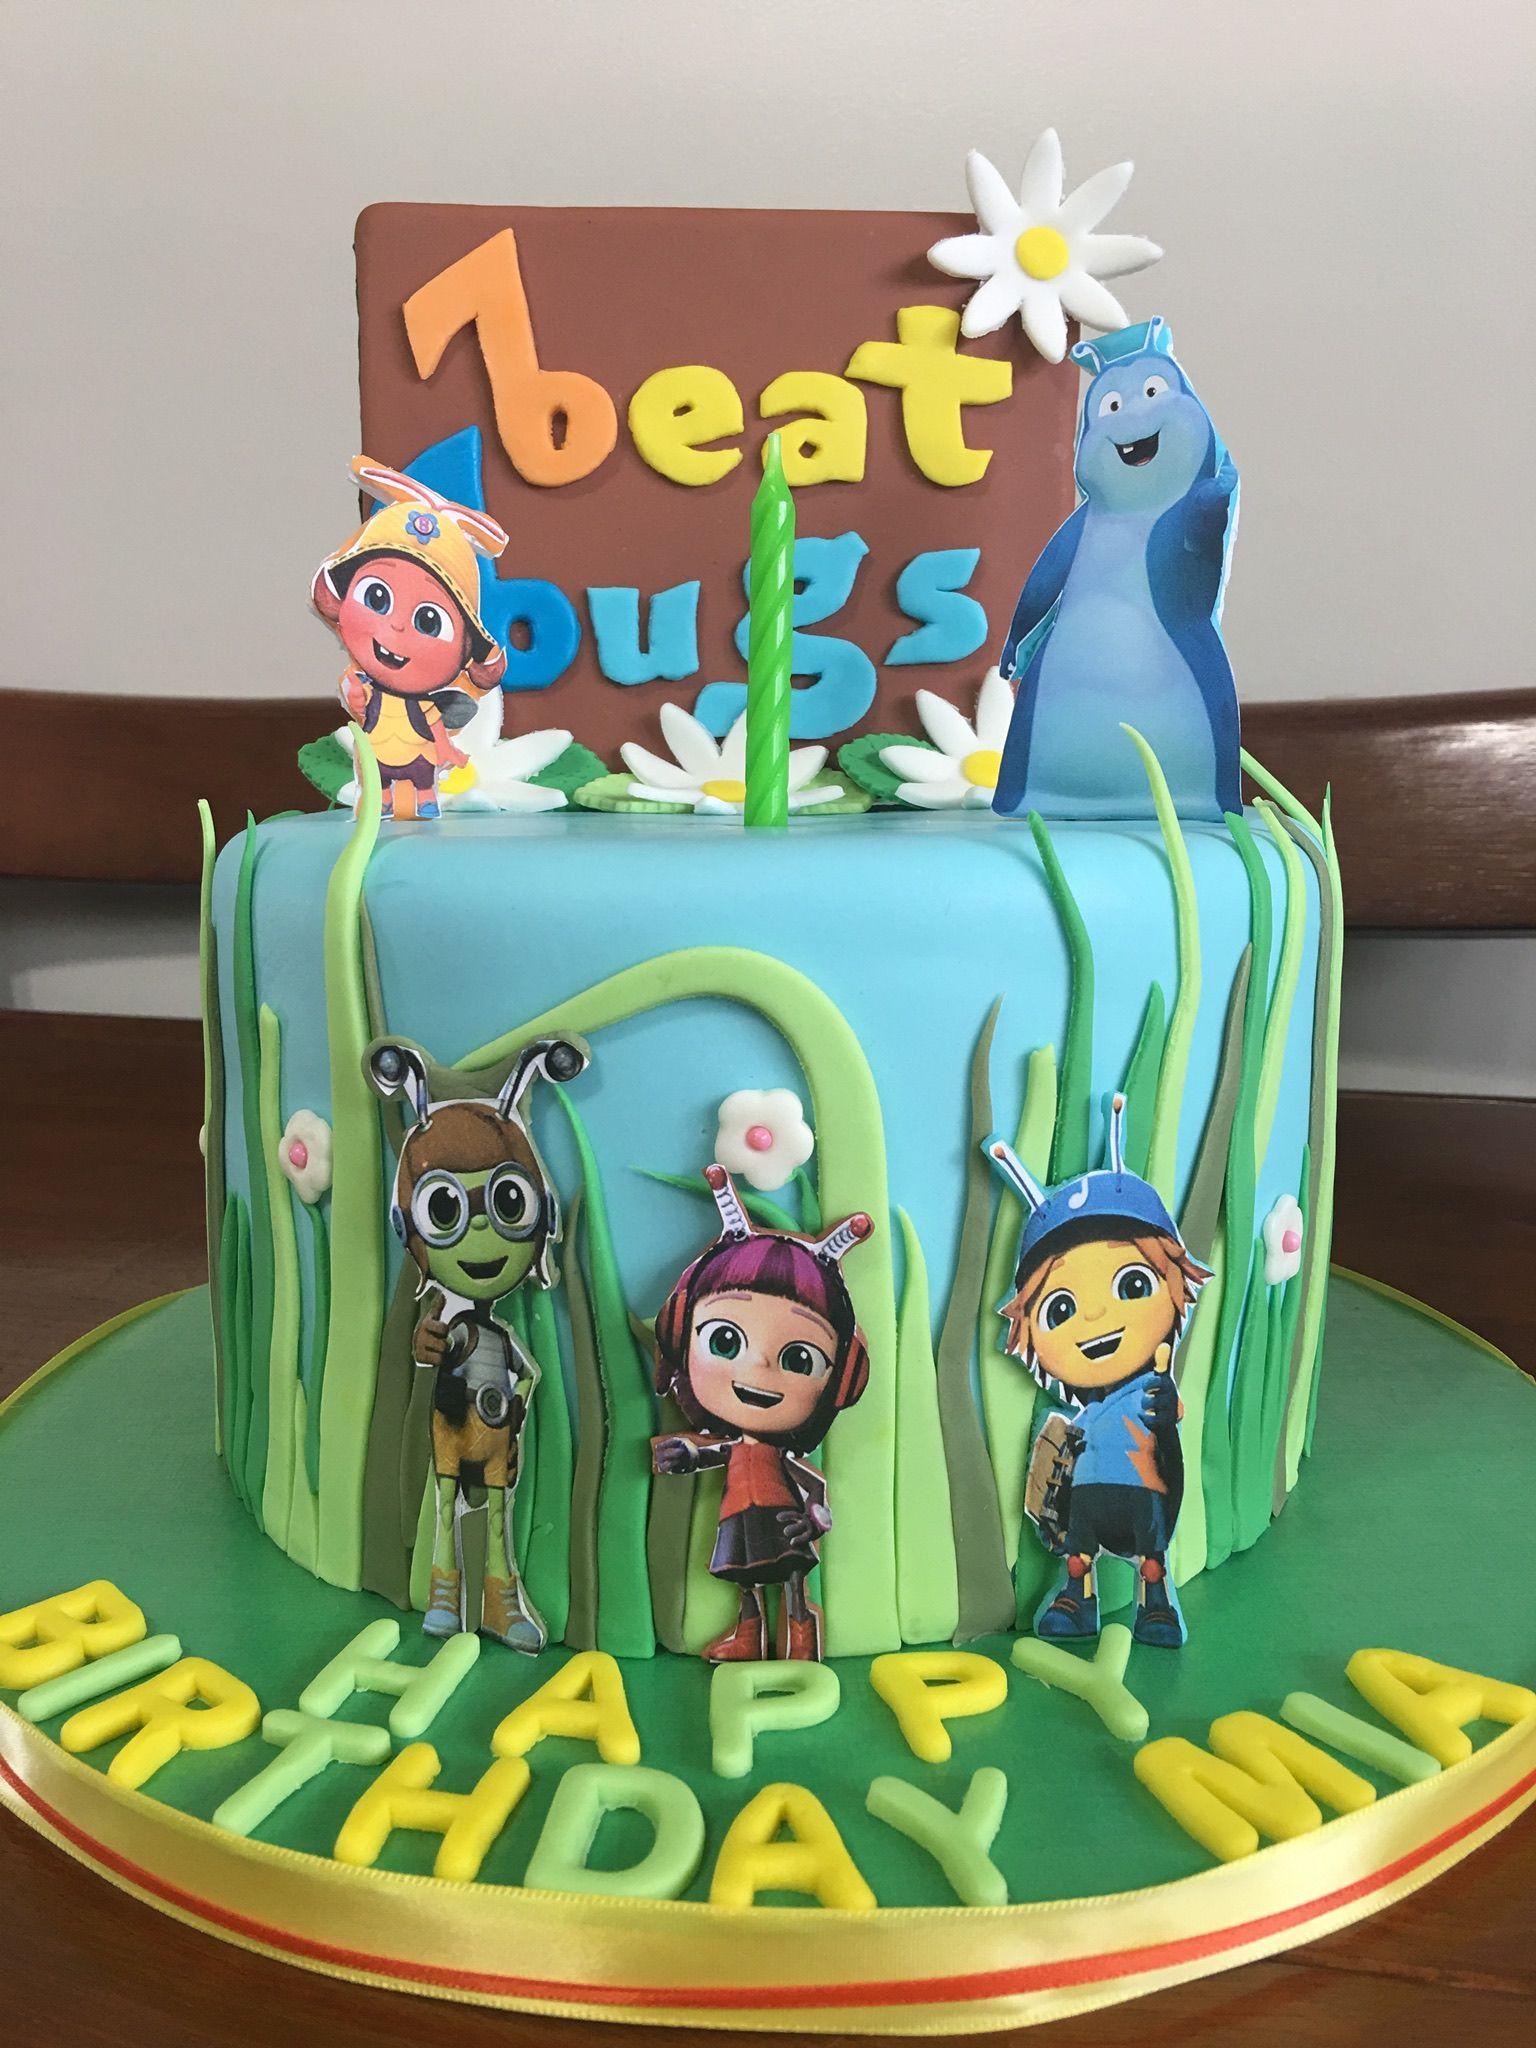 Beat Bugs Cake